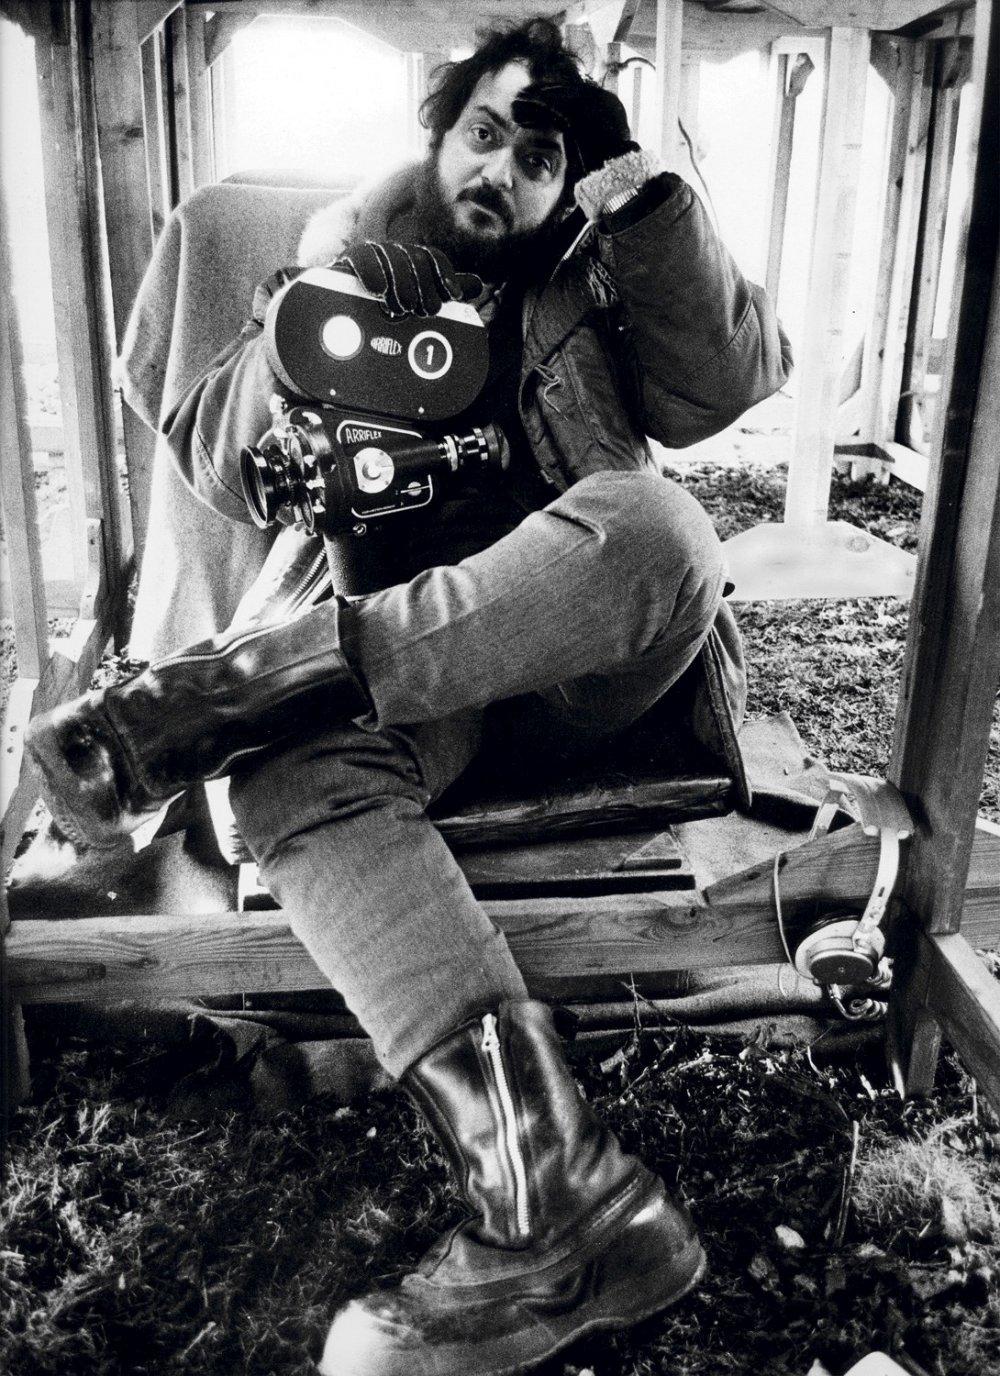 Stanley Kubrick, photographed by Dmitri Kasterine in 1970 on the set of  A Clockwork Orange  -  Image via:    bfi.org.uk